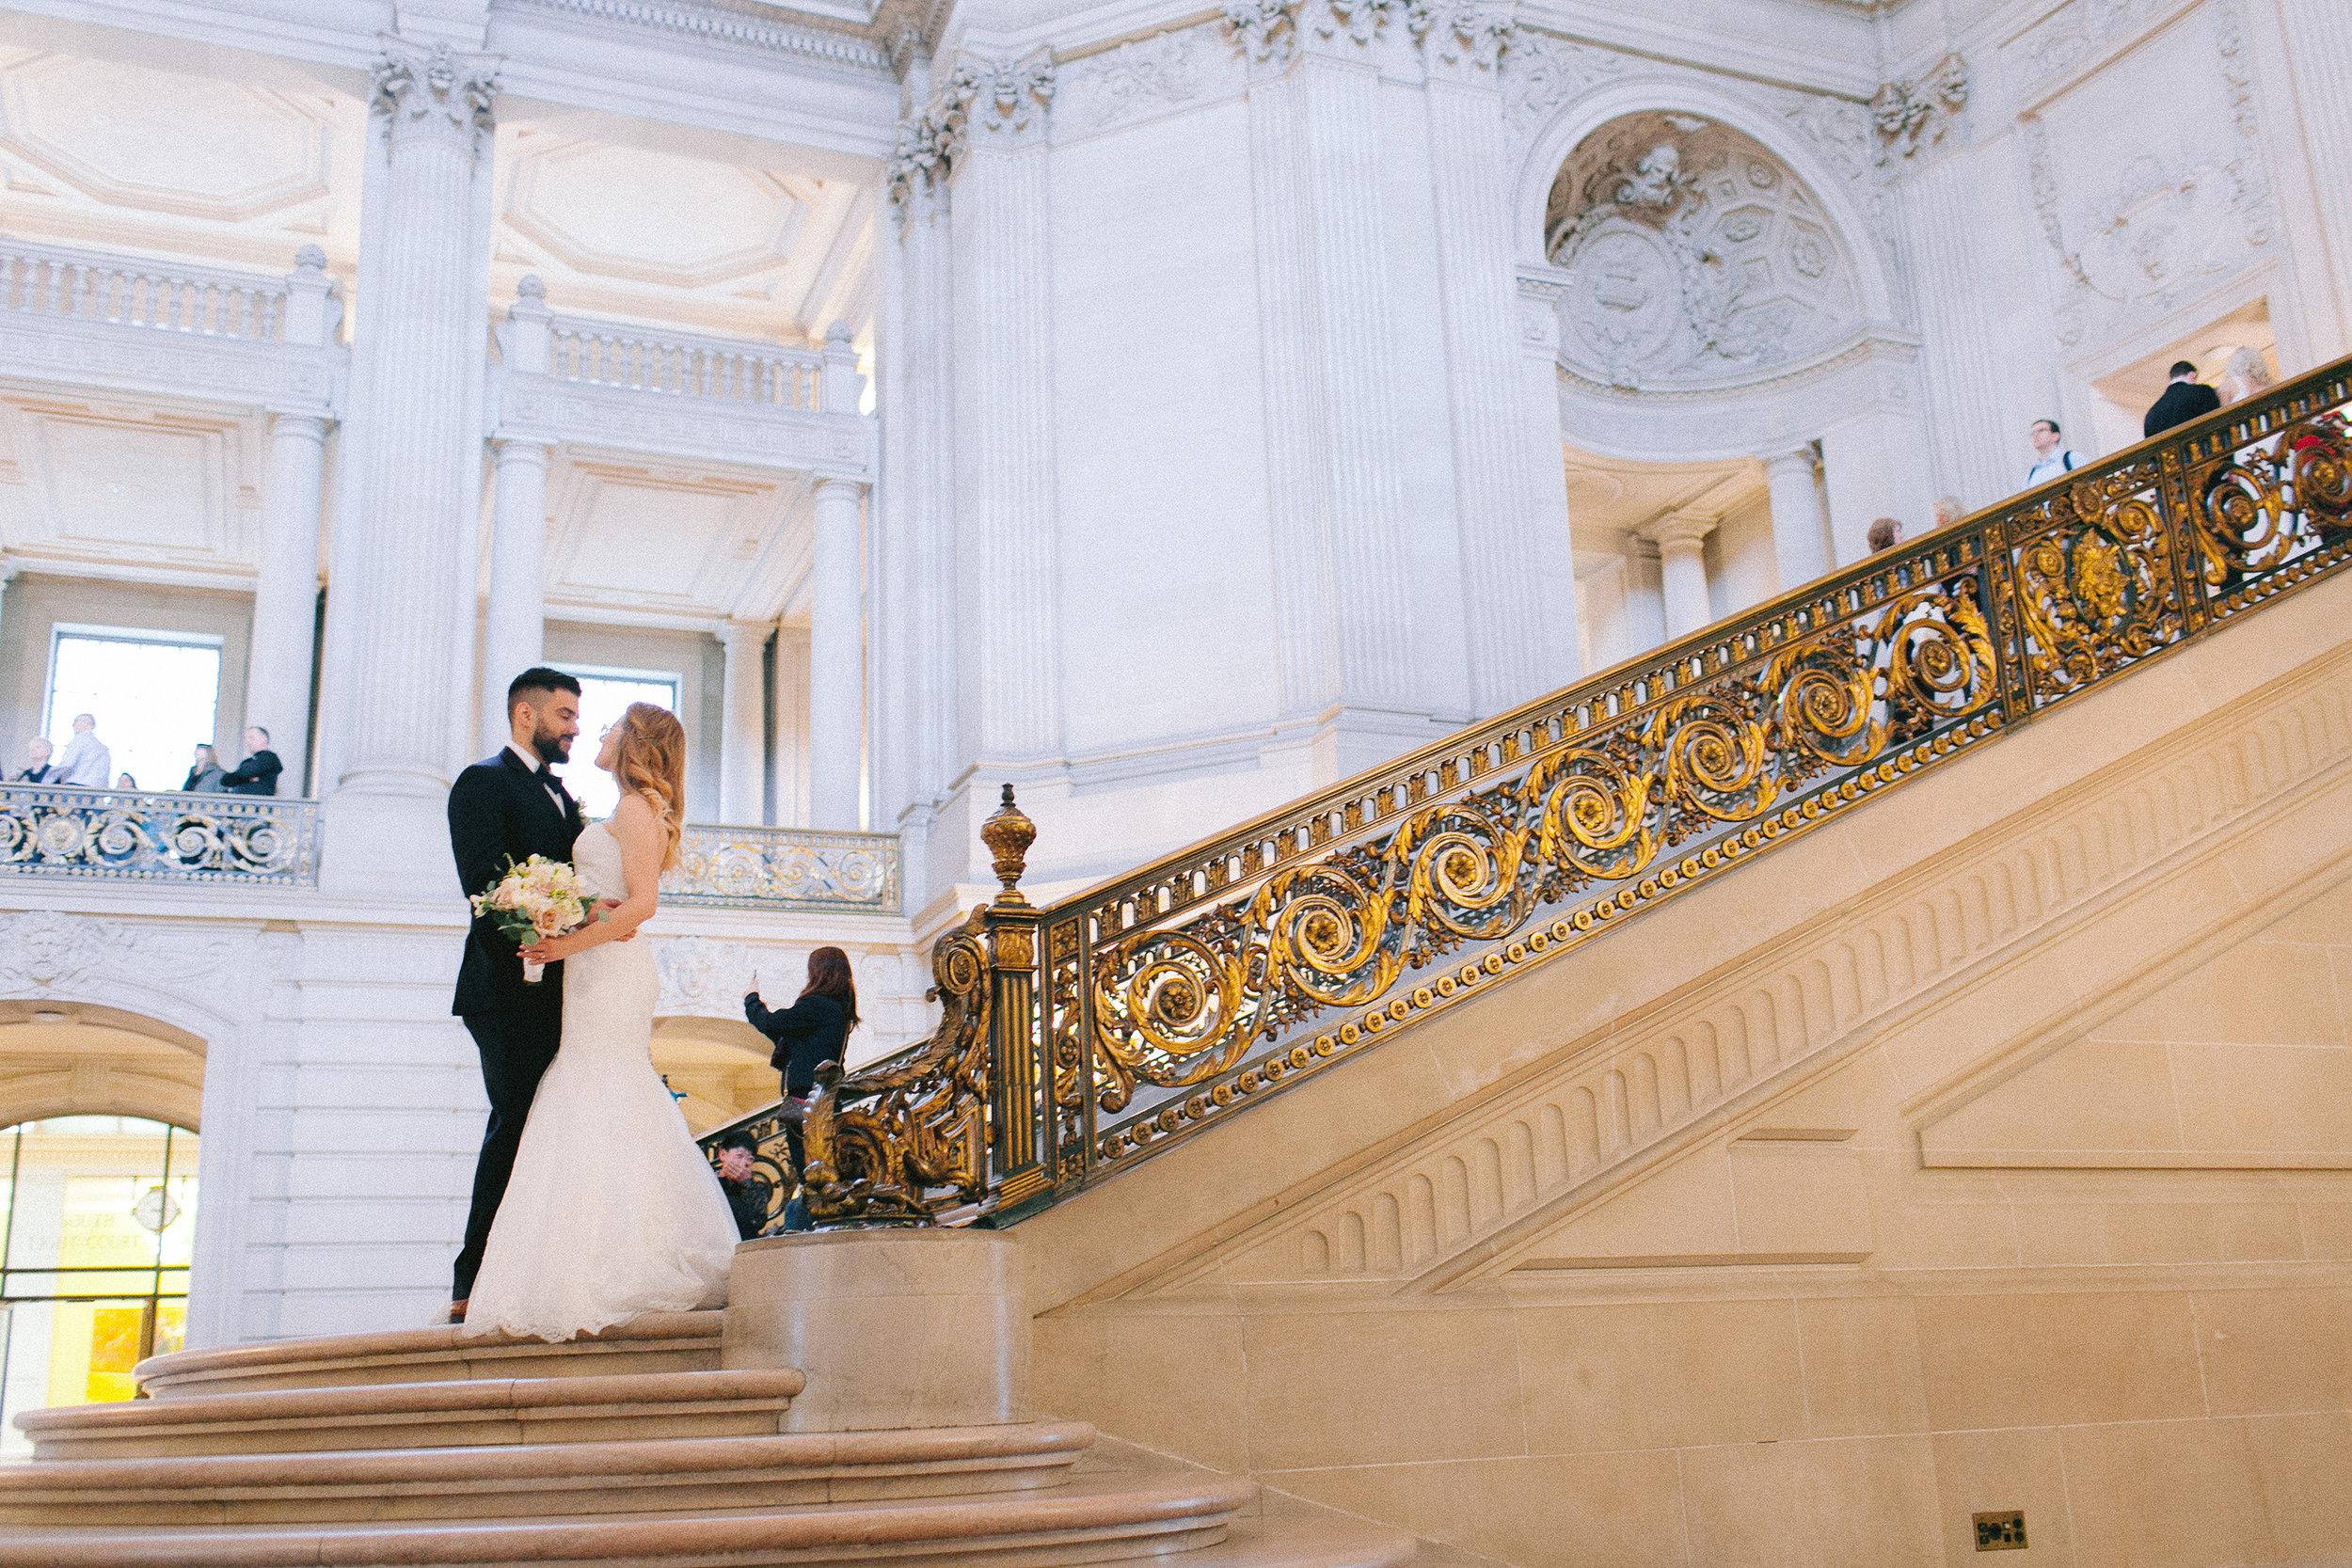 San_Francisco_City_Hall_Wedding_021.jpg